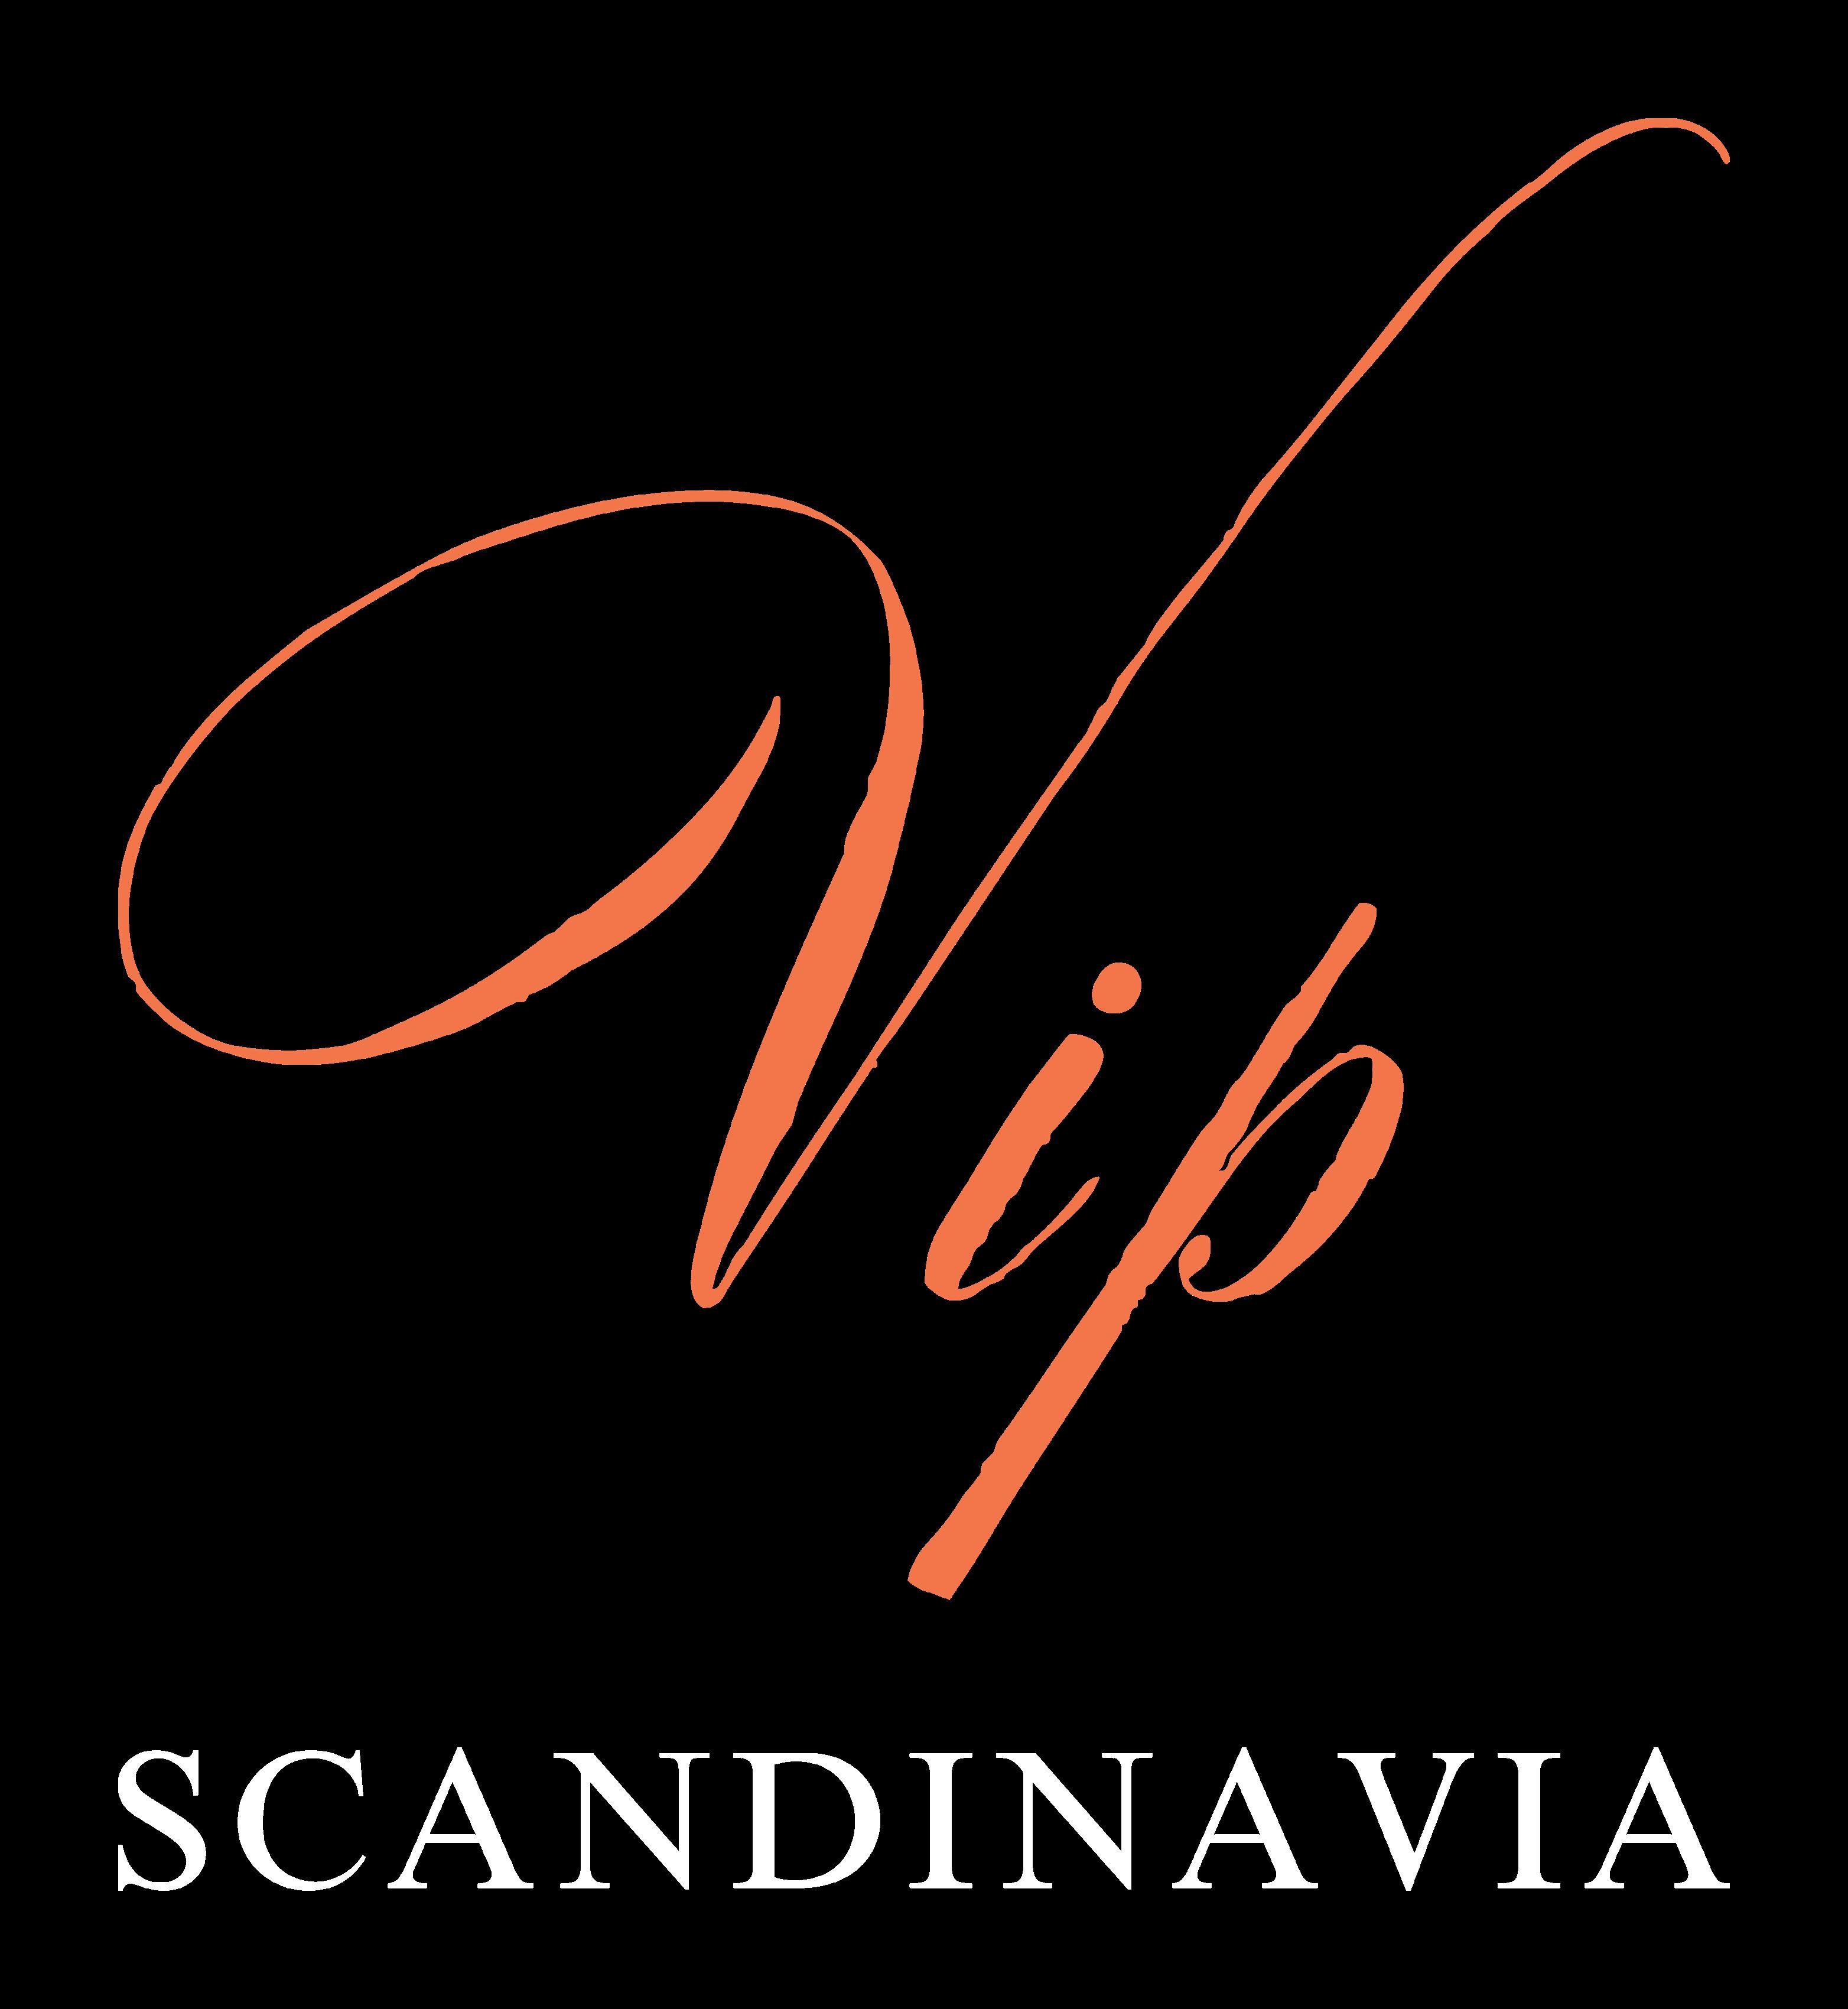 VIP Scandinavia